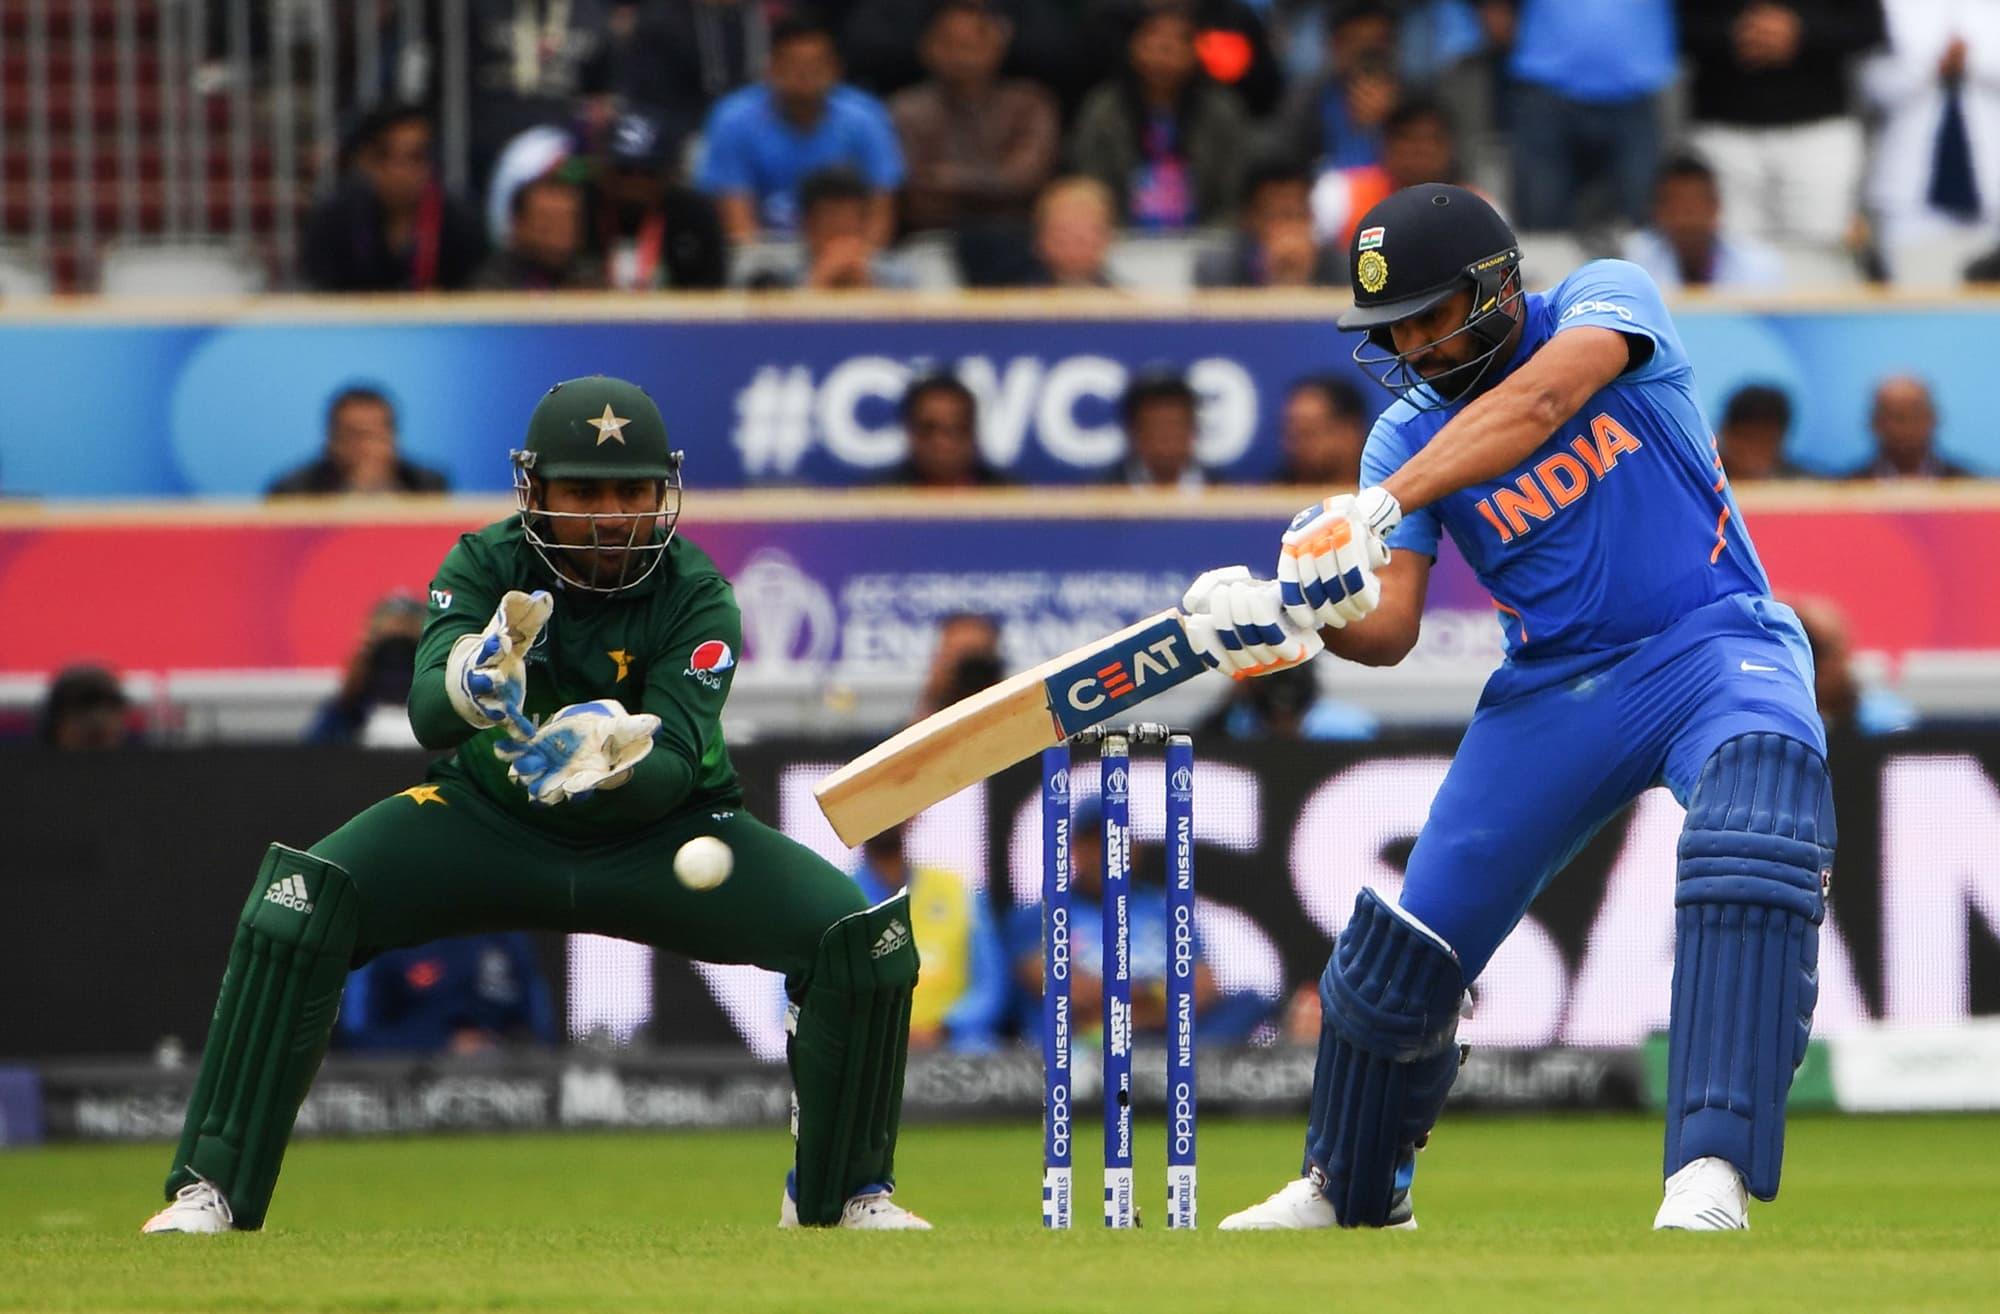 Rohit Sharma plays a shot as Sarfaraz Ahmed looks on. ─ AFP